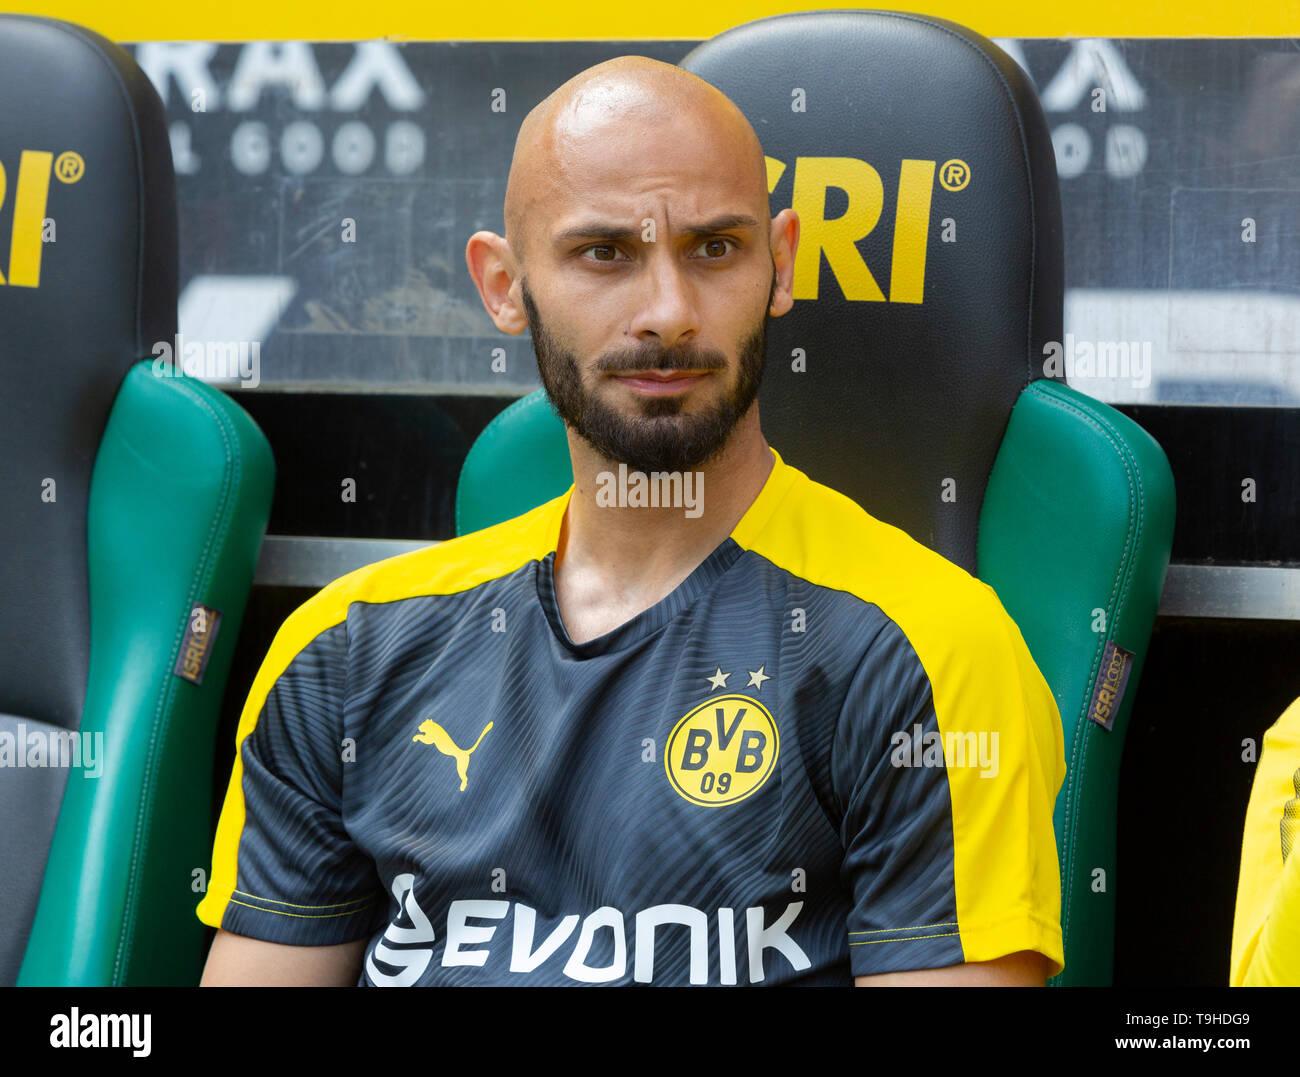 sports, football, Bundesliga, 2018/2019, Borussia Moenchengladbach vs. BVB Borussia Dortmund 0-2, Stadium Borussia Park, players bench, Oemer Toprak (BVB), DFL REGULATIONS PROHIBIT ANY USE OF PHOTOGRAPHS AS IMAGE SEQUENCES AND/OR QUASI-VIDEO - Stock Image